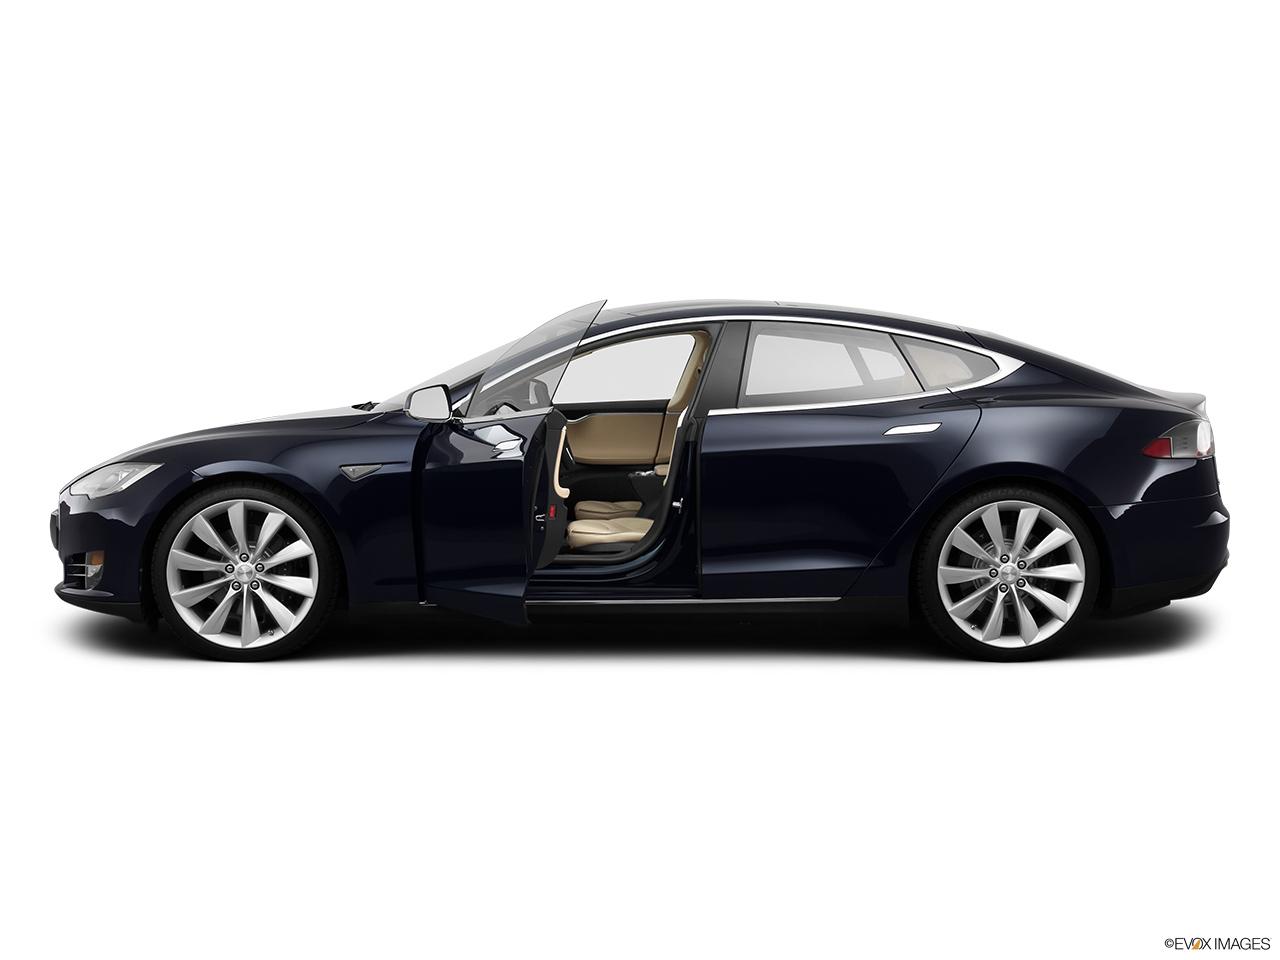 2013 Tesla Model S Sedan Performance Front Angle View 2013